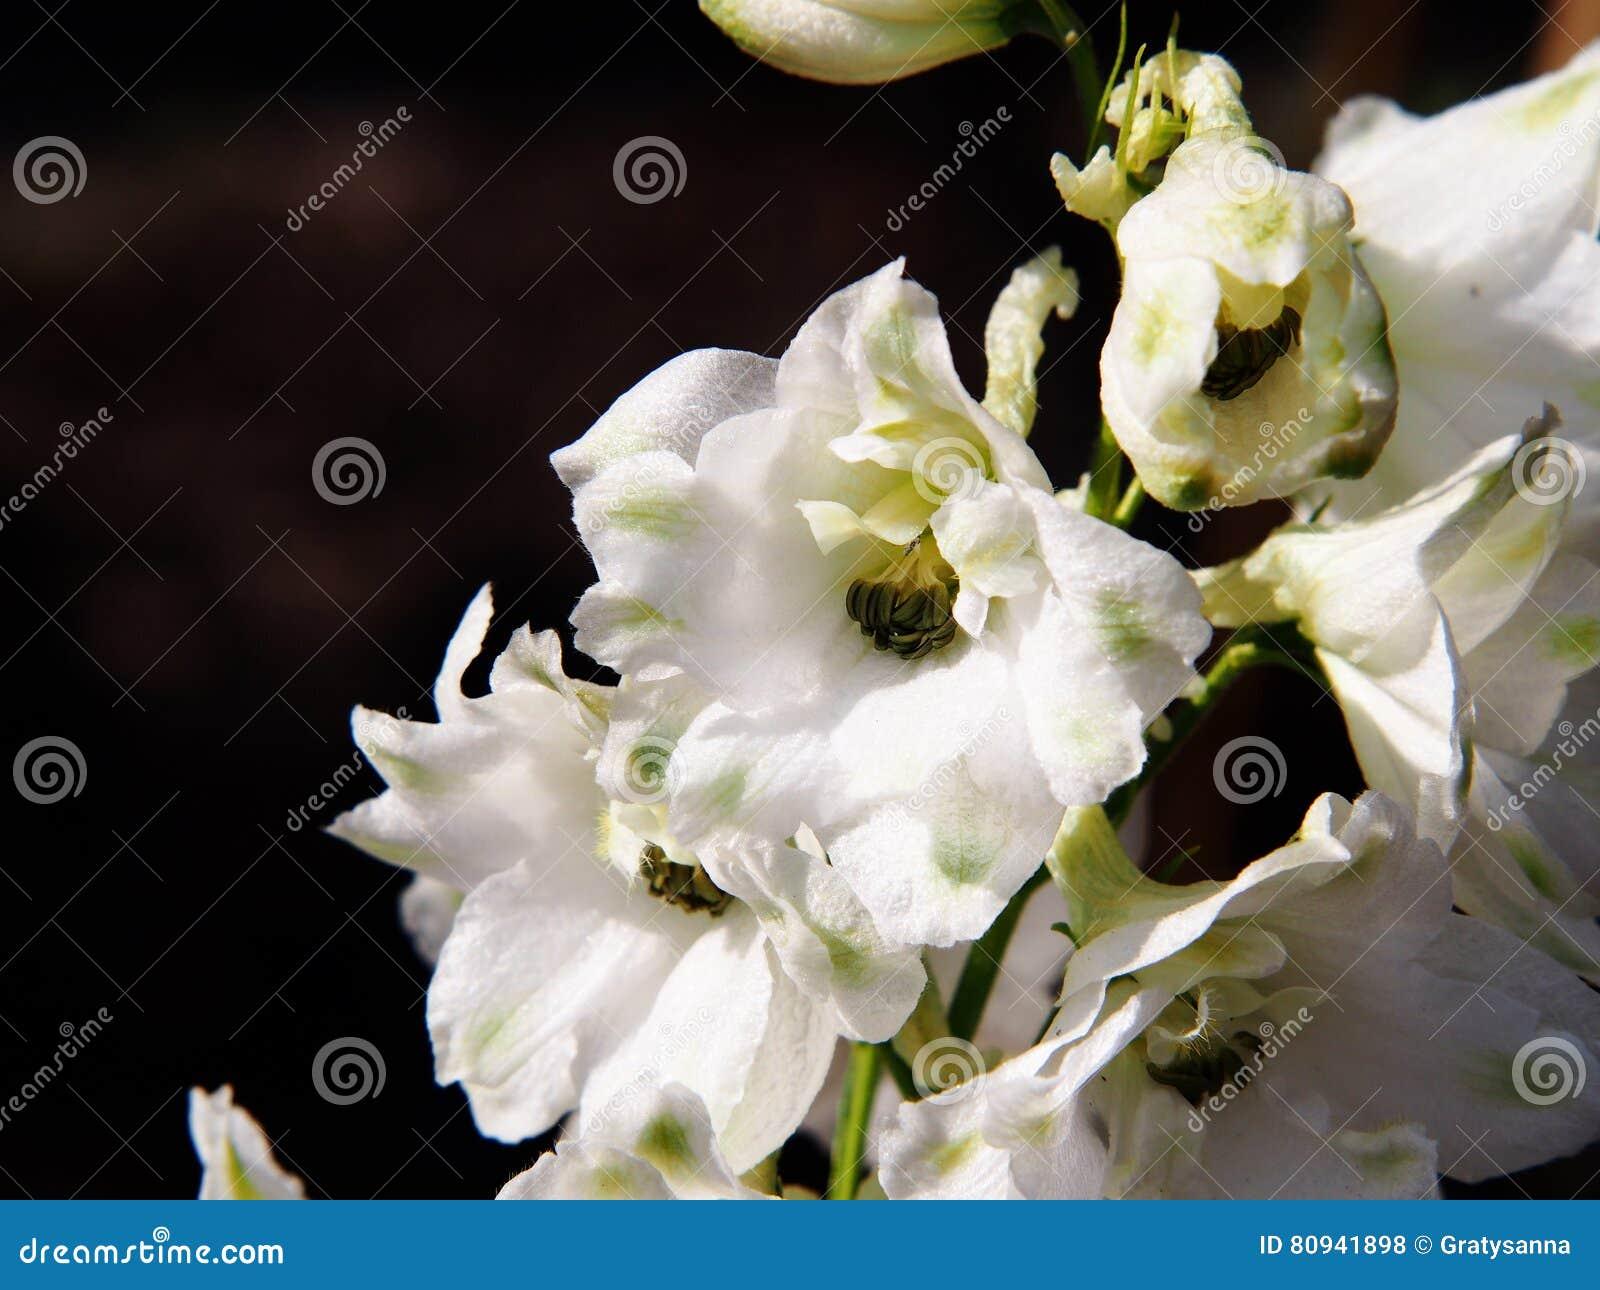 Delphinium larkspur stock photo image of flower closeup 80941898 download comp mightylinksfo